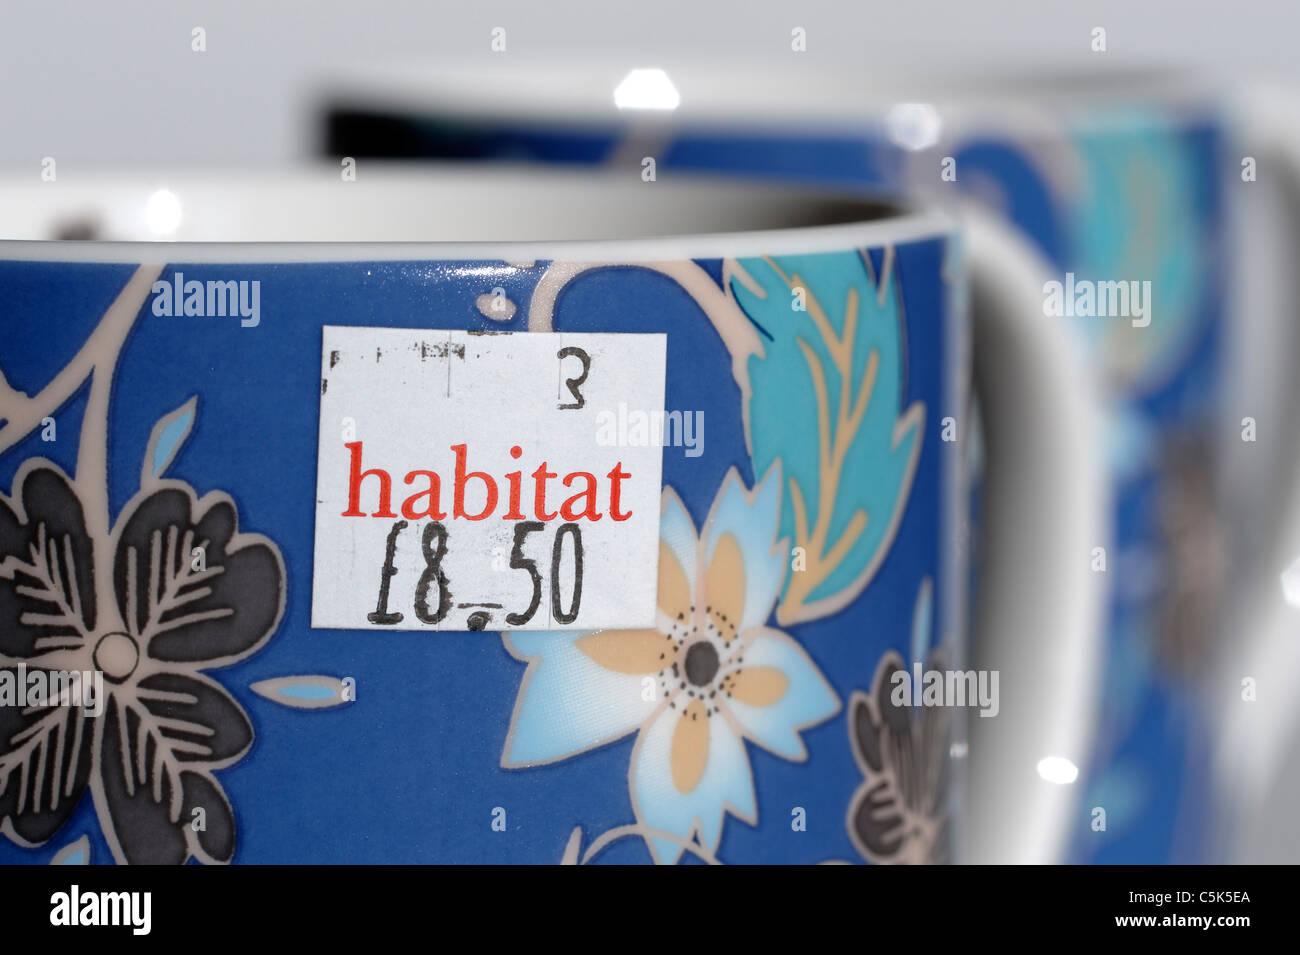 Habitat price sticker - Stock Image